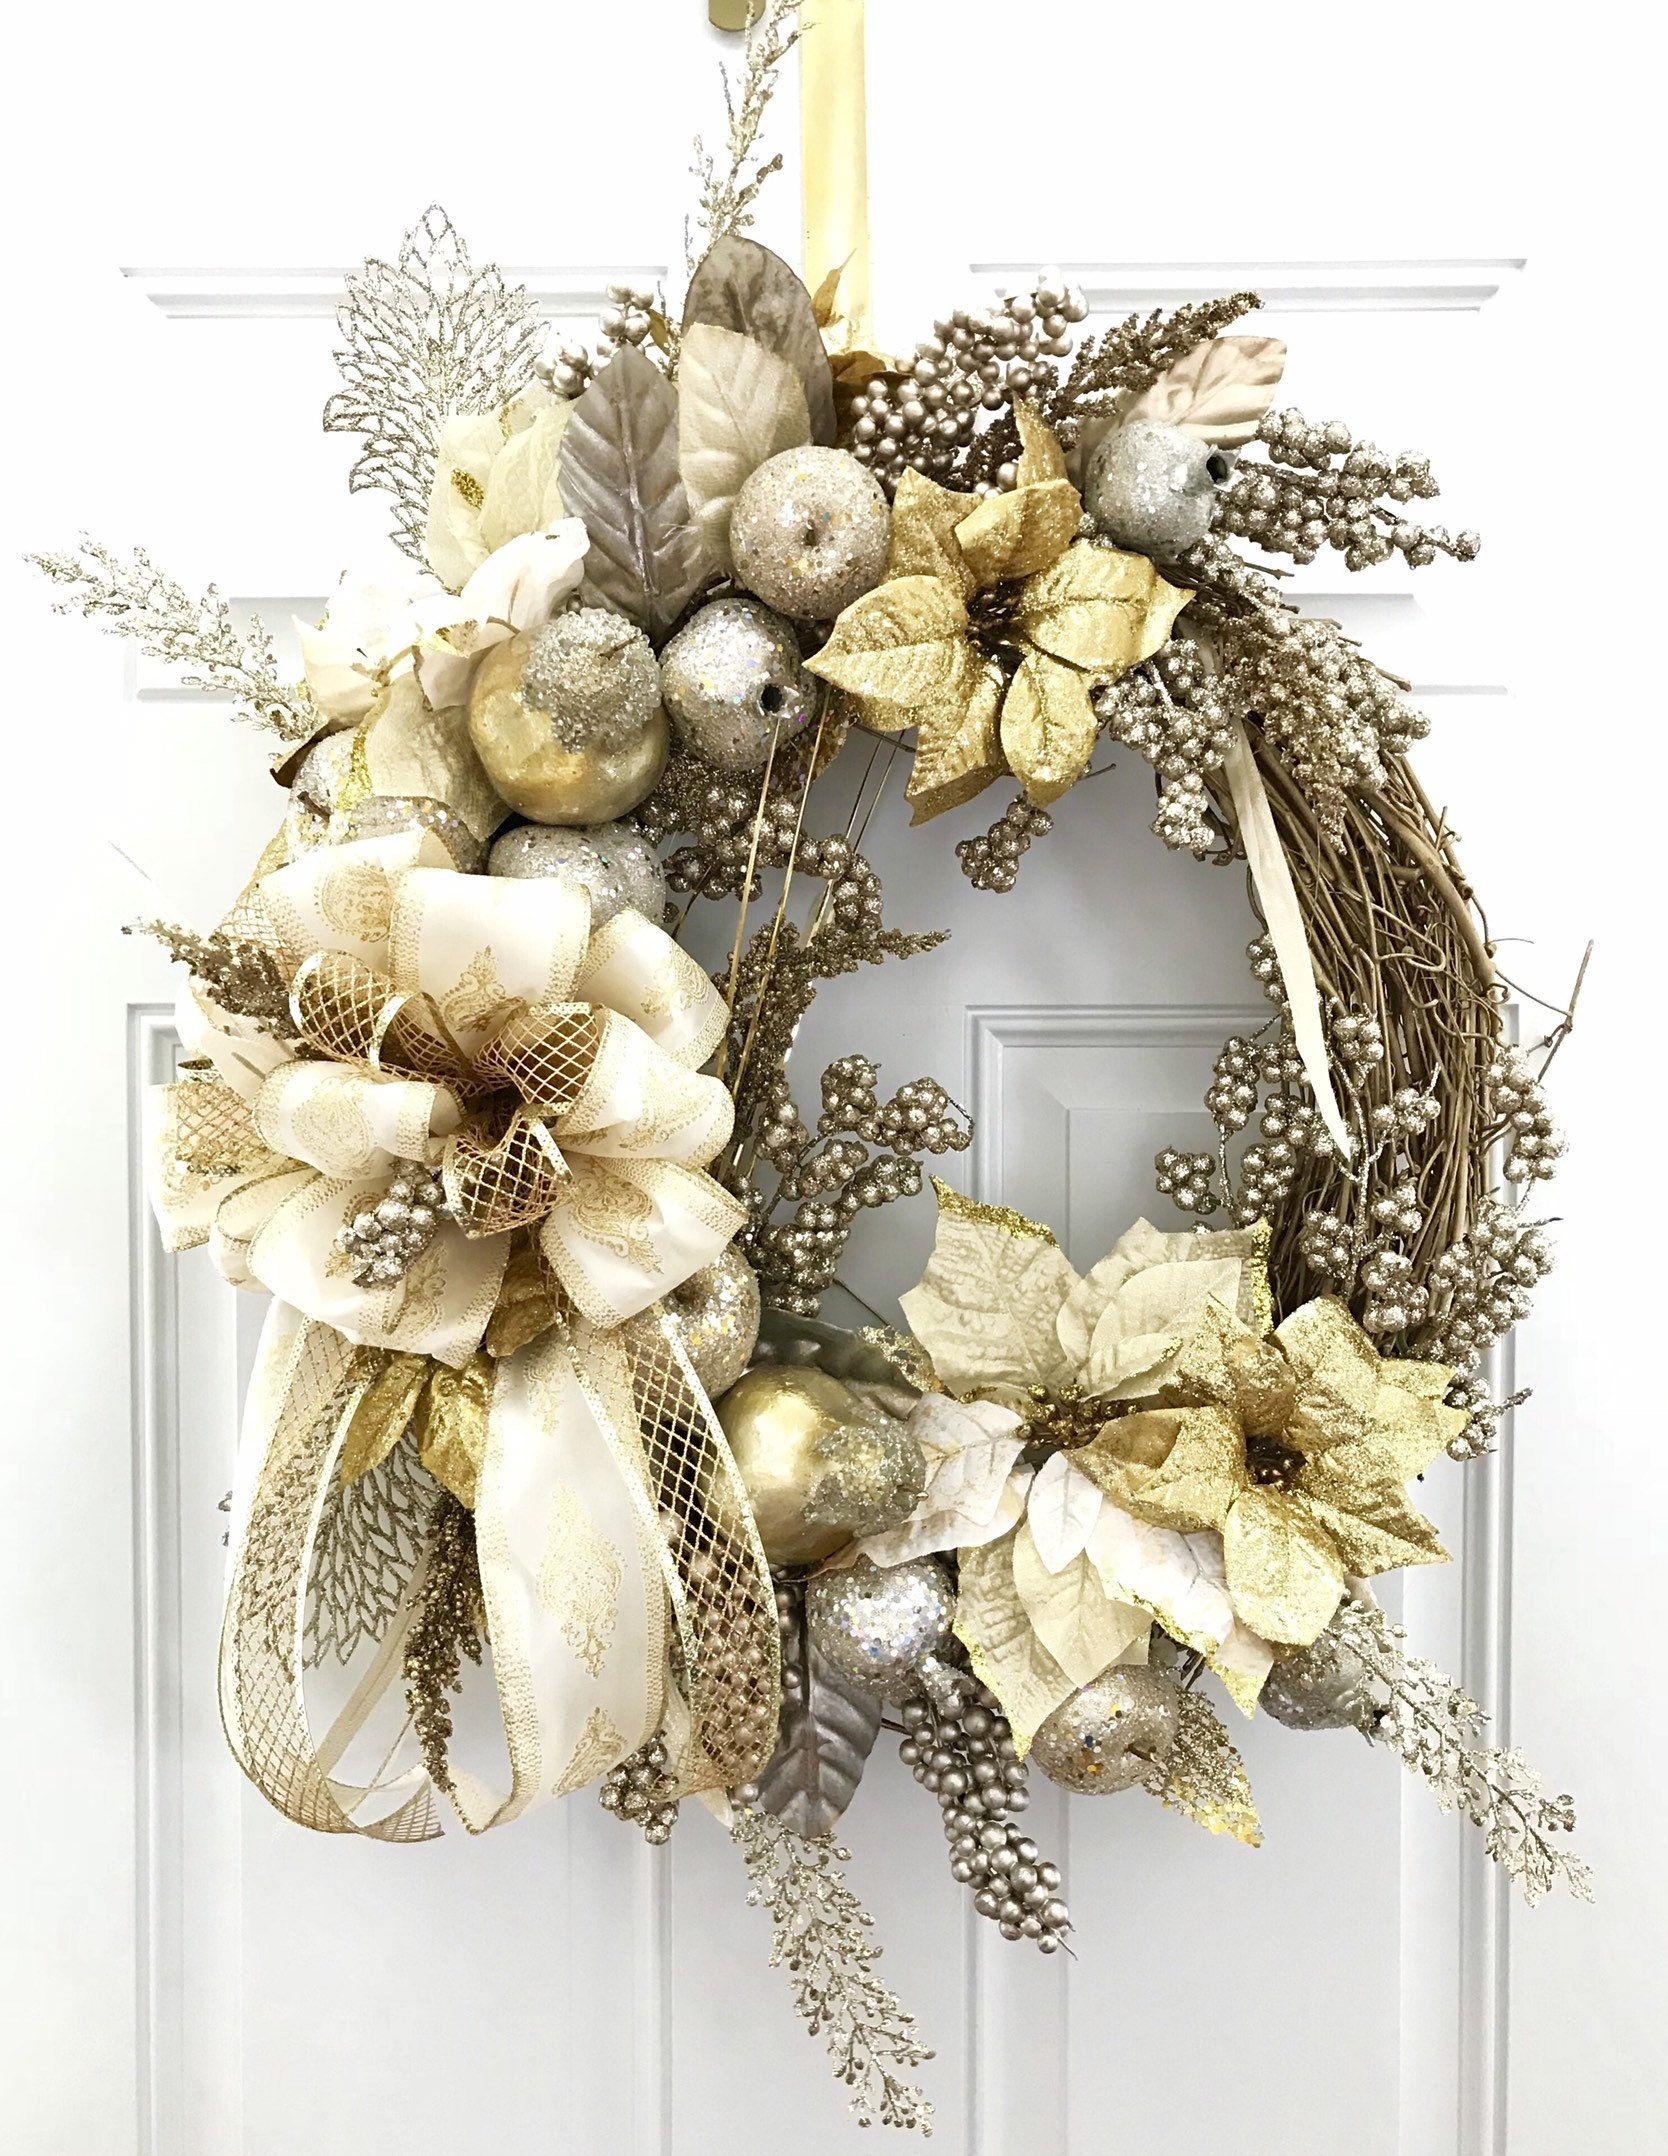 Christmas Elegance Gold And Silver Wreath Sparkly Elegant Poinsettia By Janselegantwreaths On Etsy